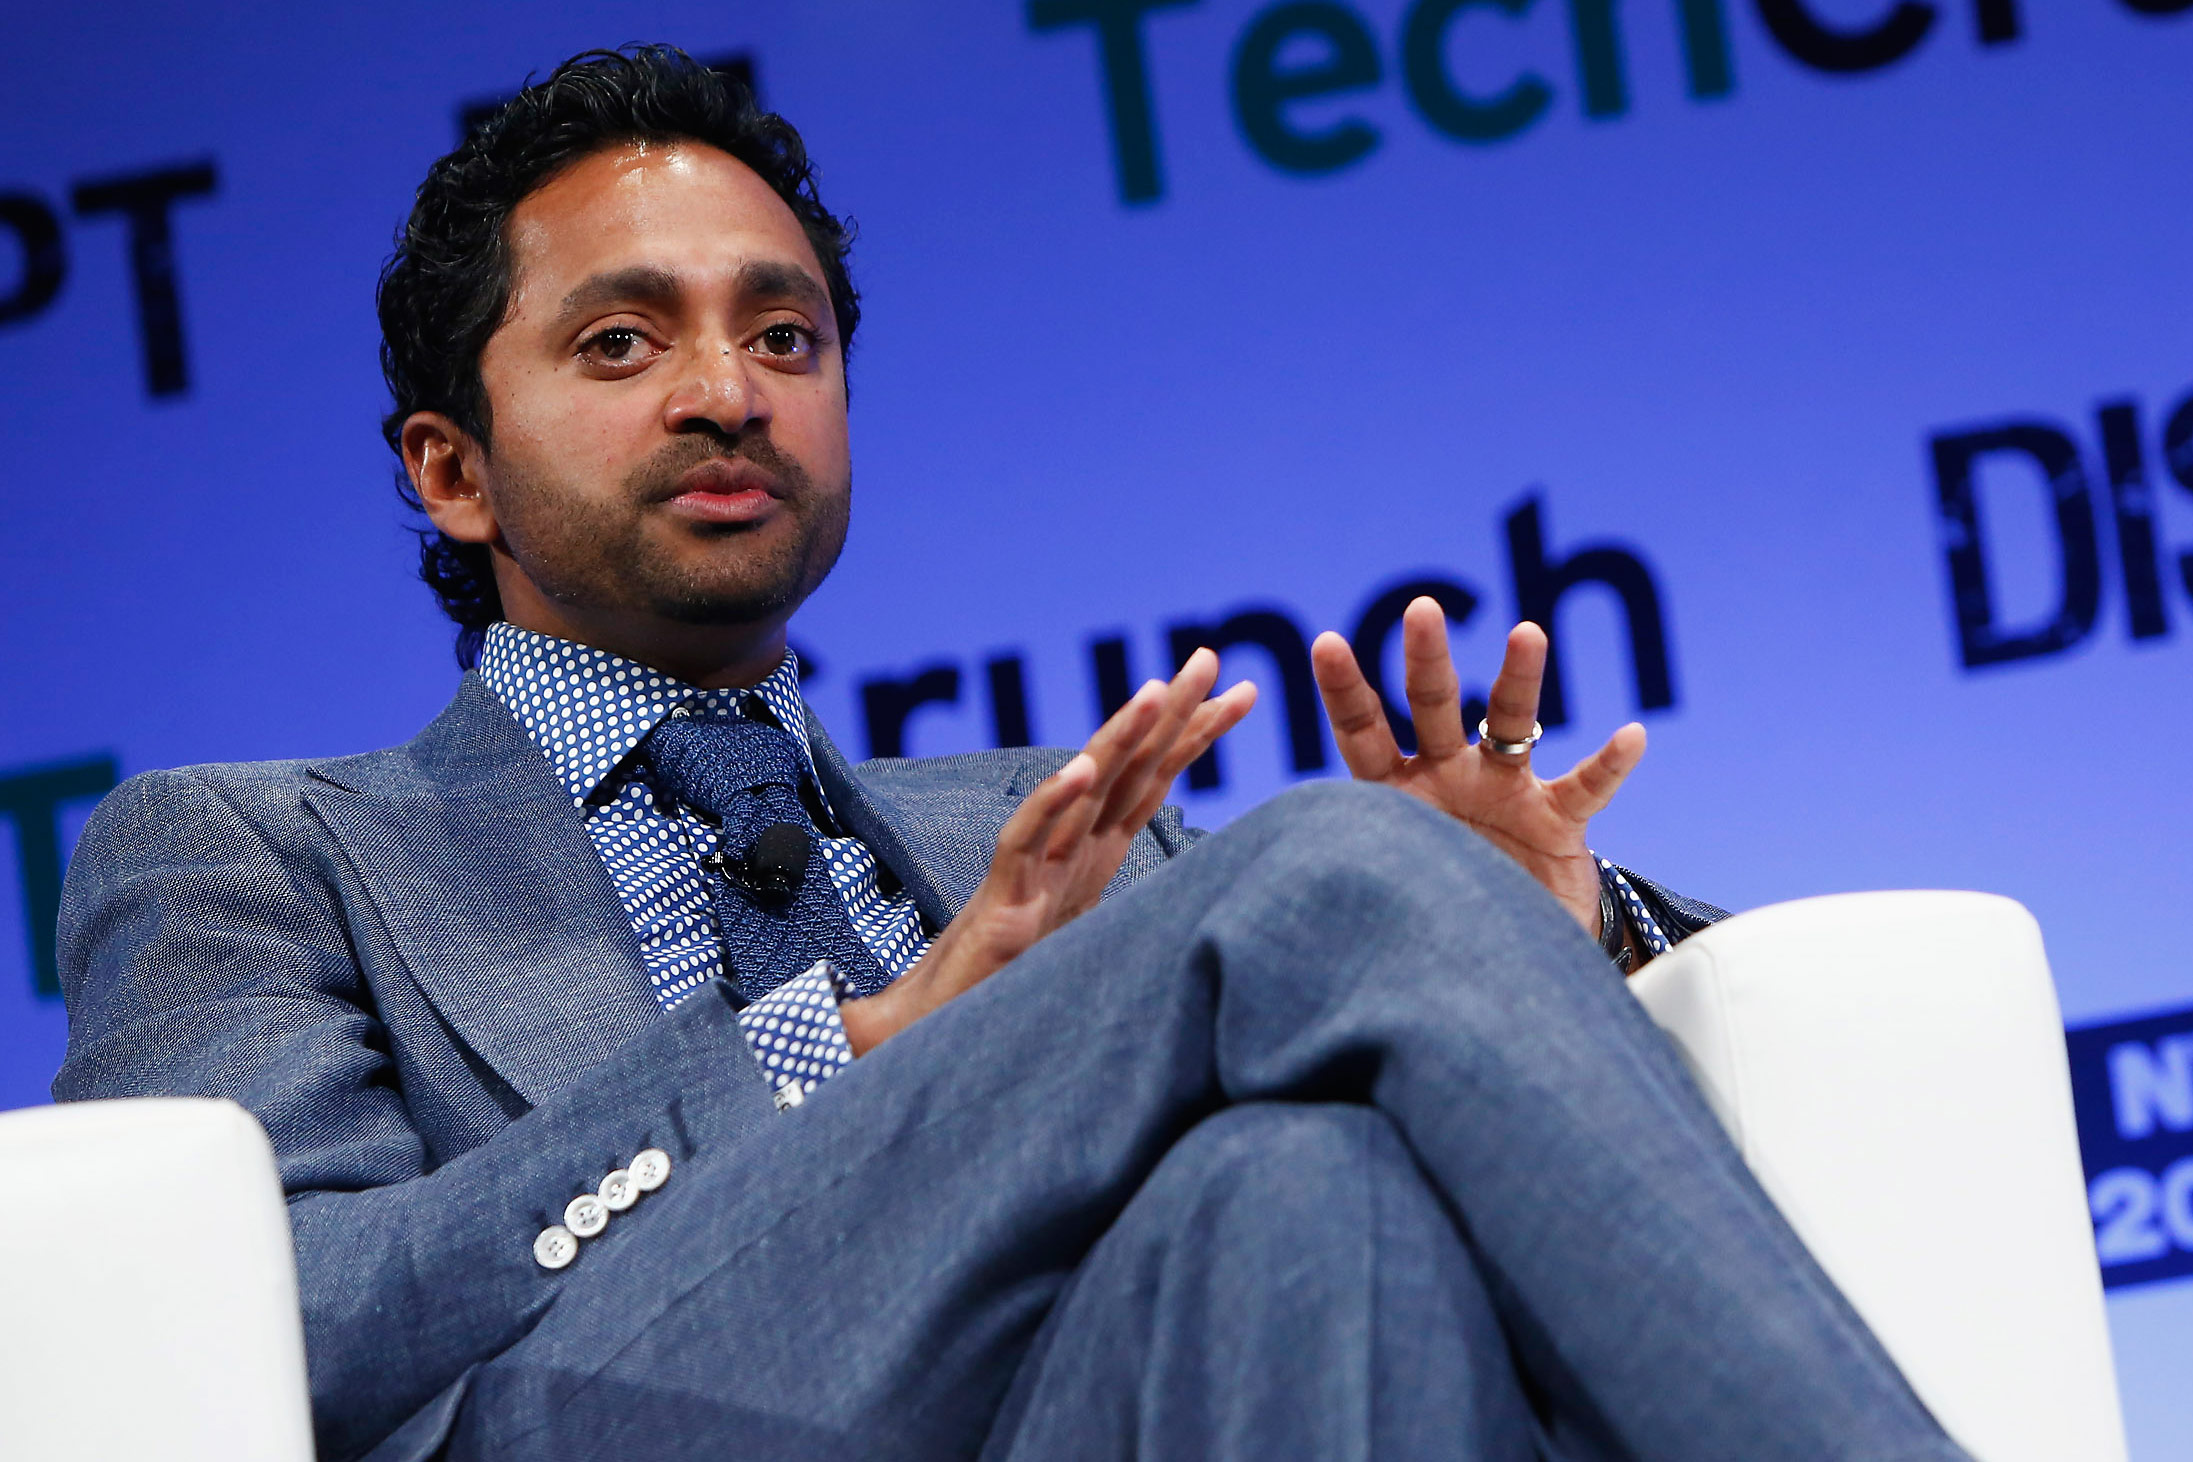 Former Facebook executive Chamath Palihapitiya to raise $500M for a large fund